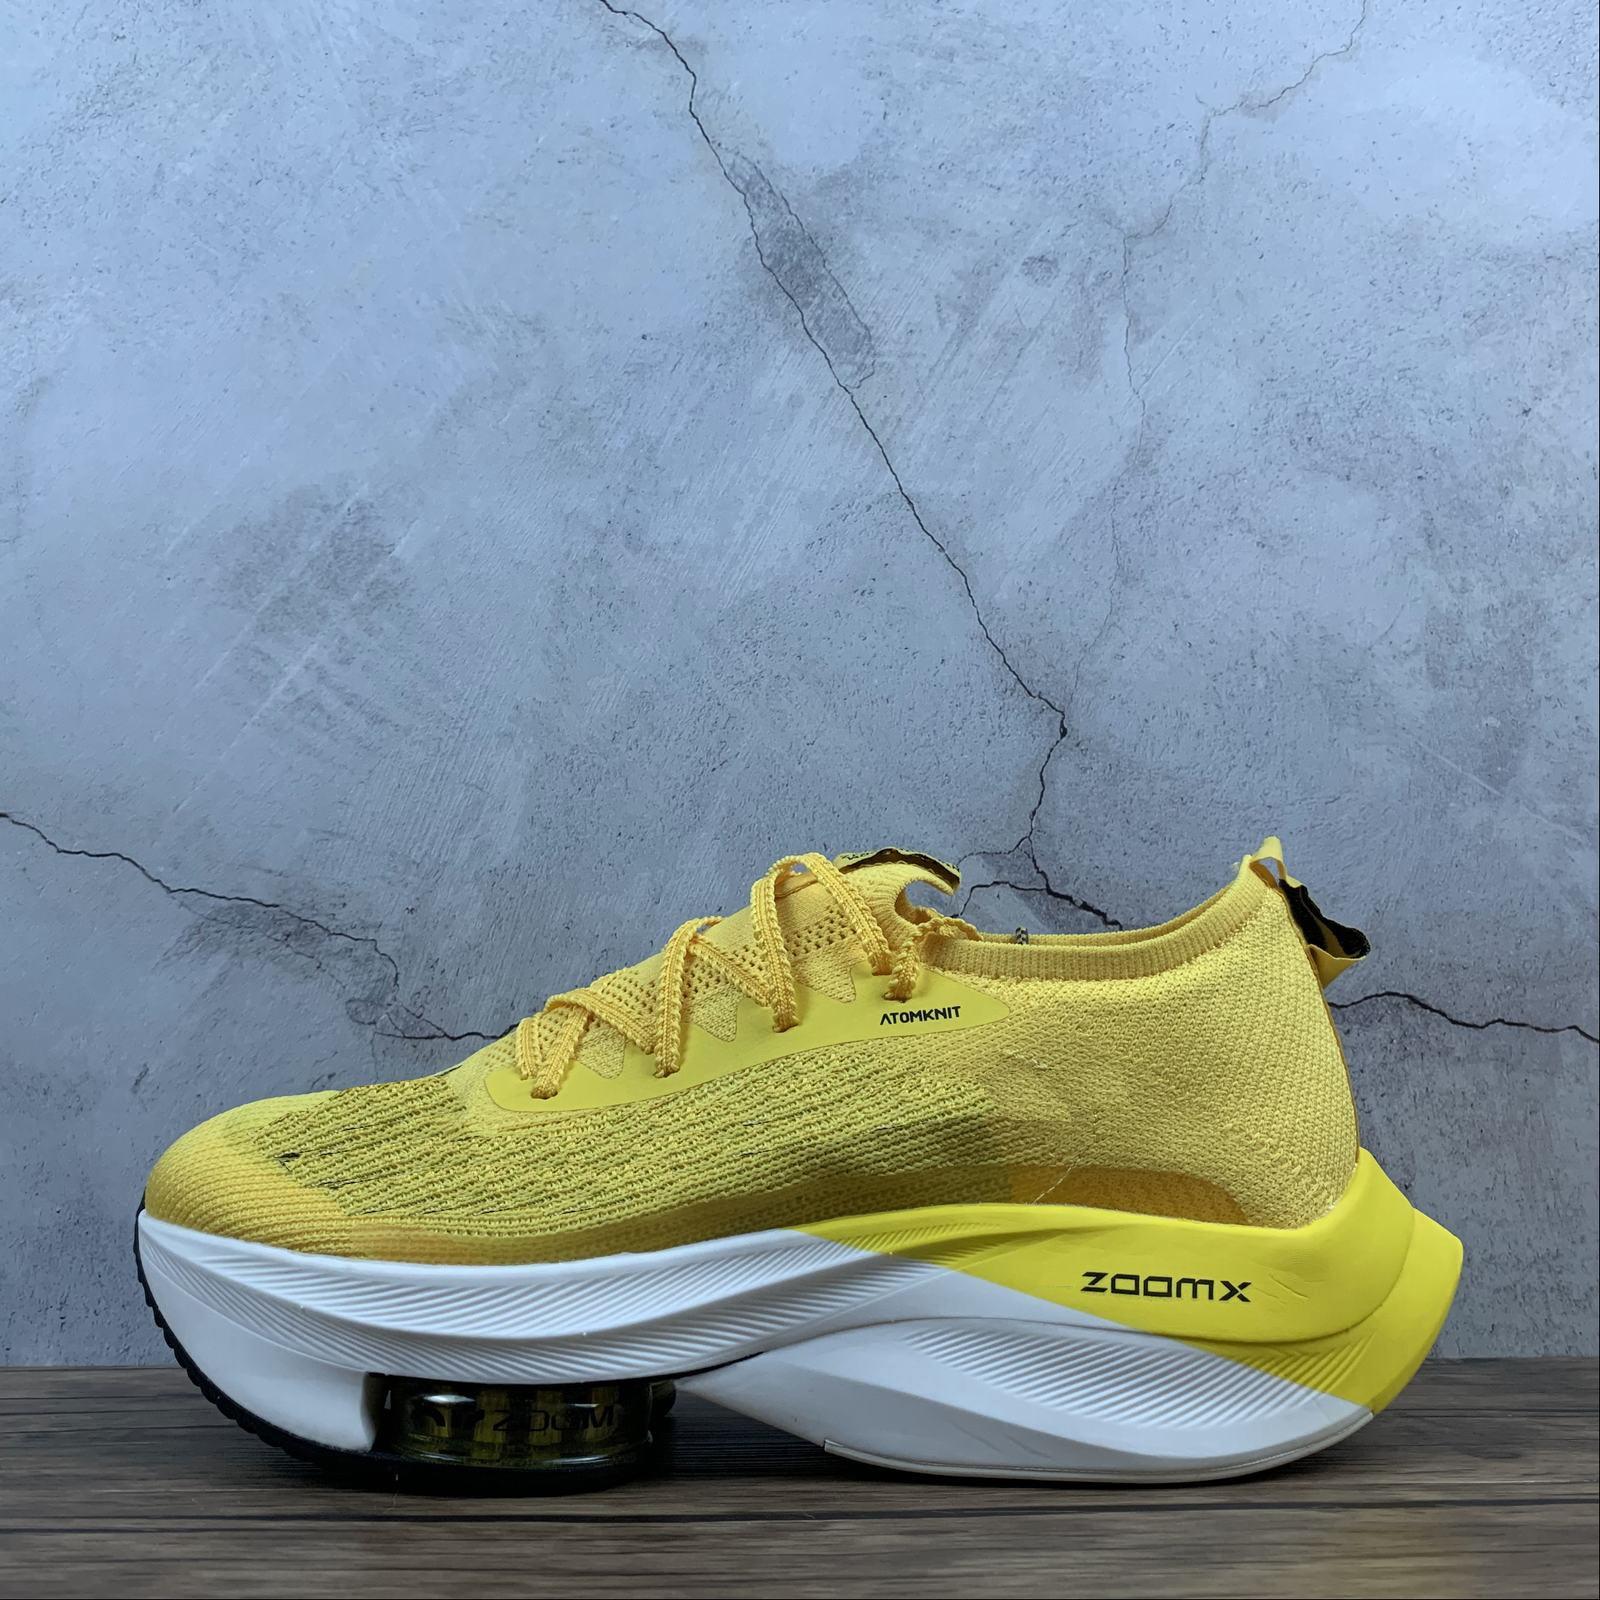 comfortable men's running shoes